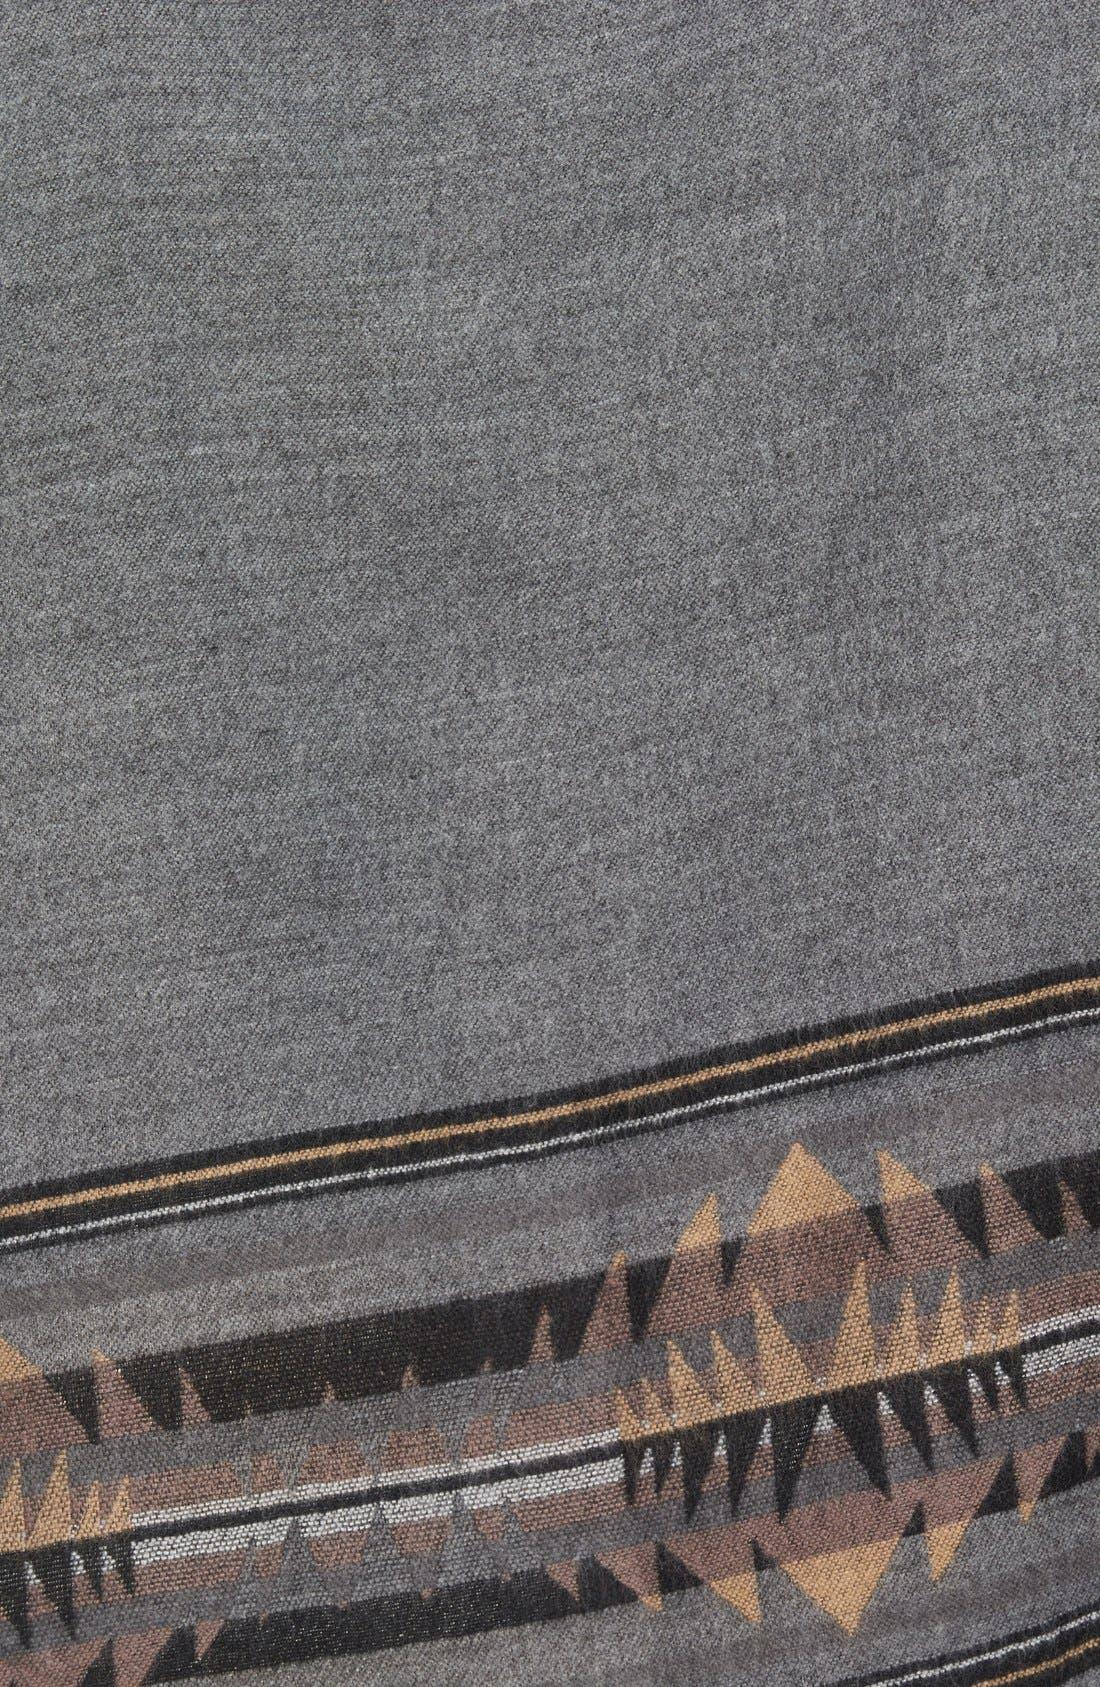 Alternate Image 3  - BP. 'Wanderlust' Blanket Poncho